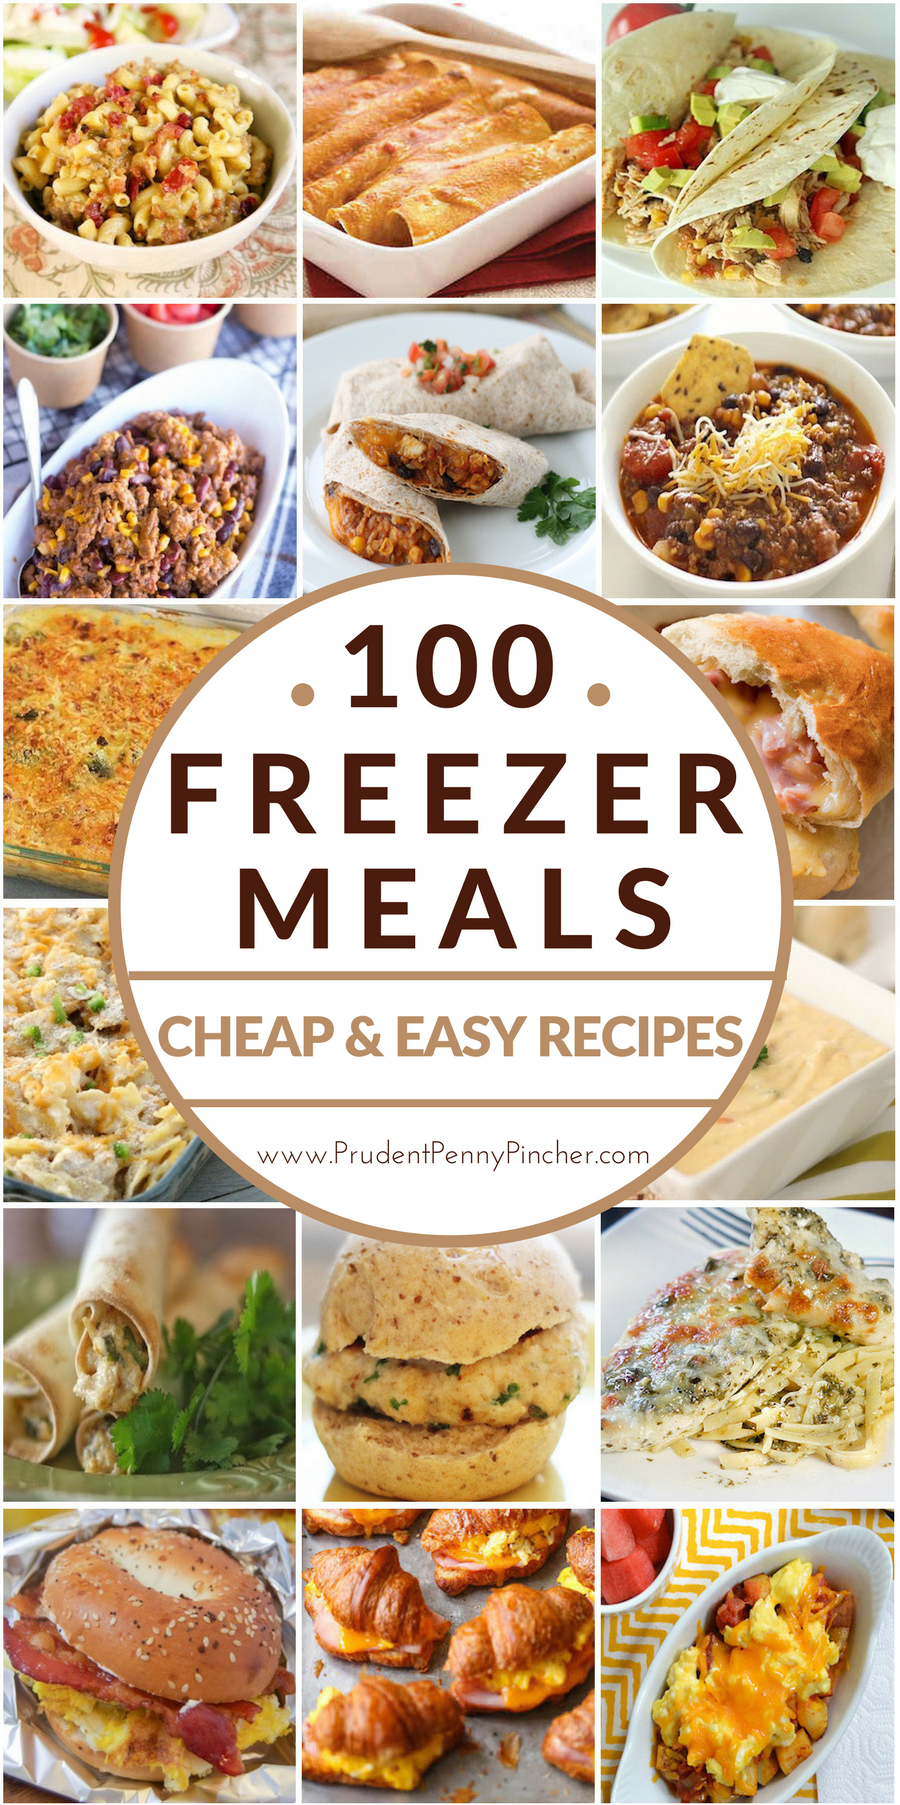 100 Cheap Easy Freezer Meals Freezable Meals Freezer Meal Planning Slow Cooker Freezer Meals